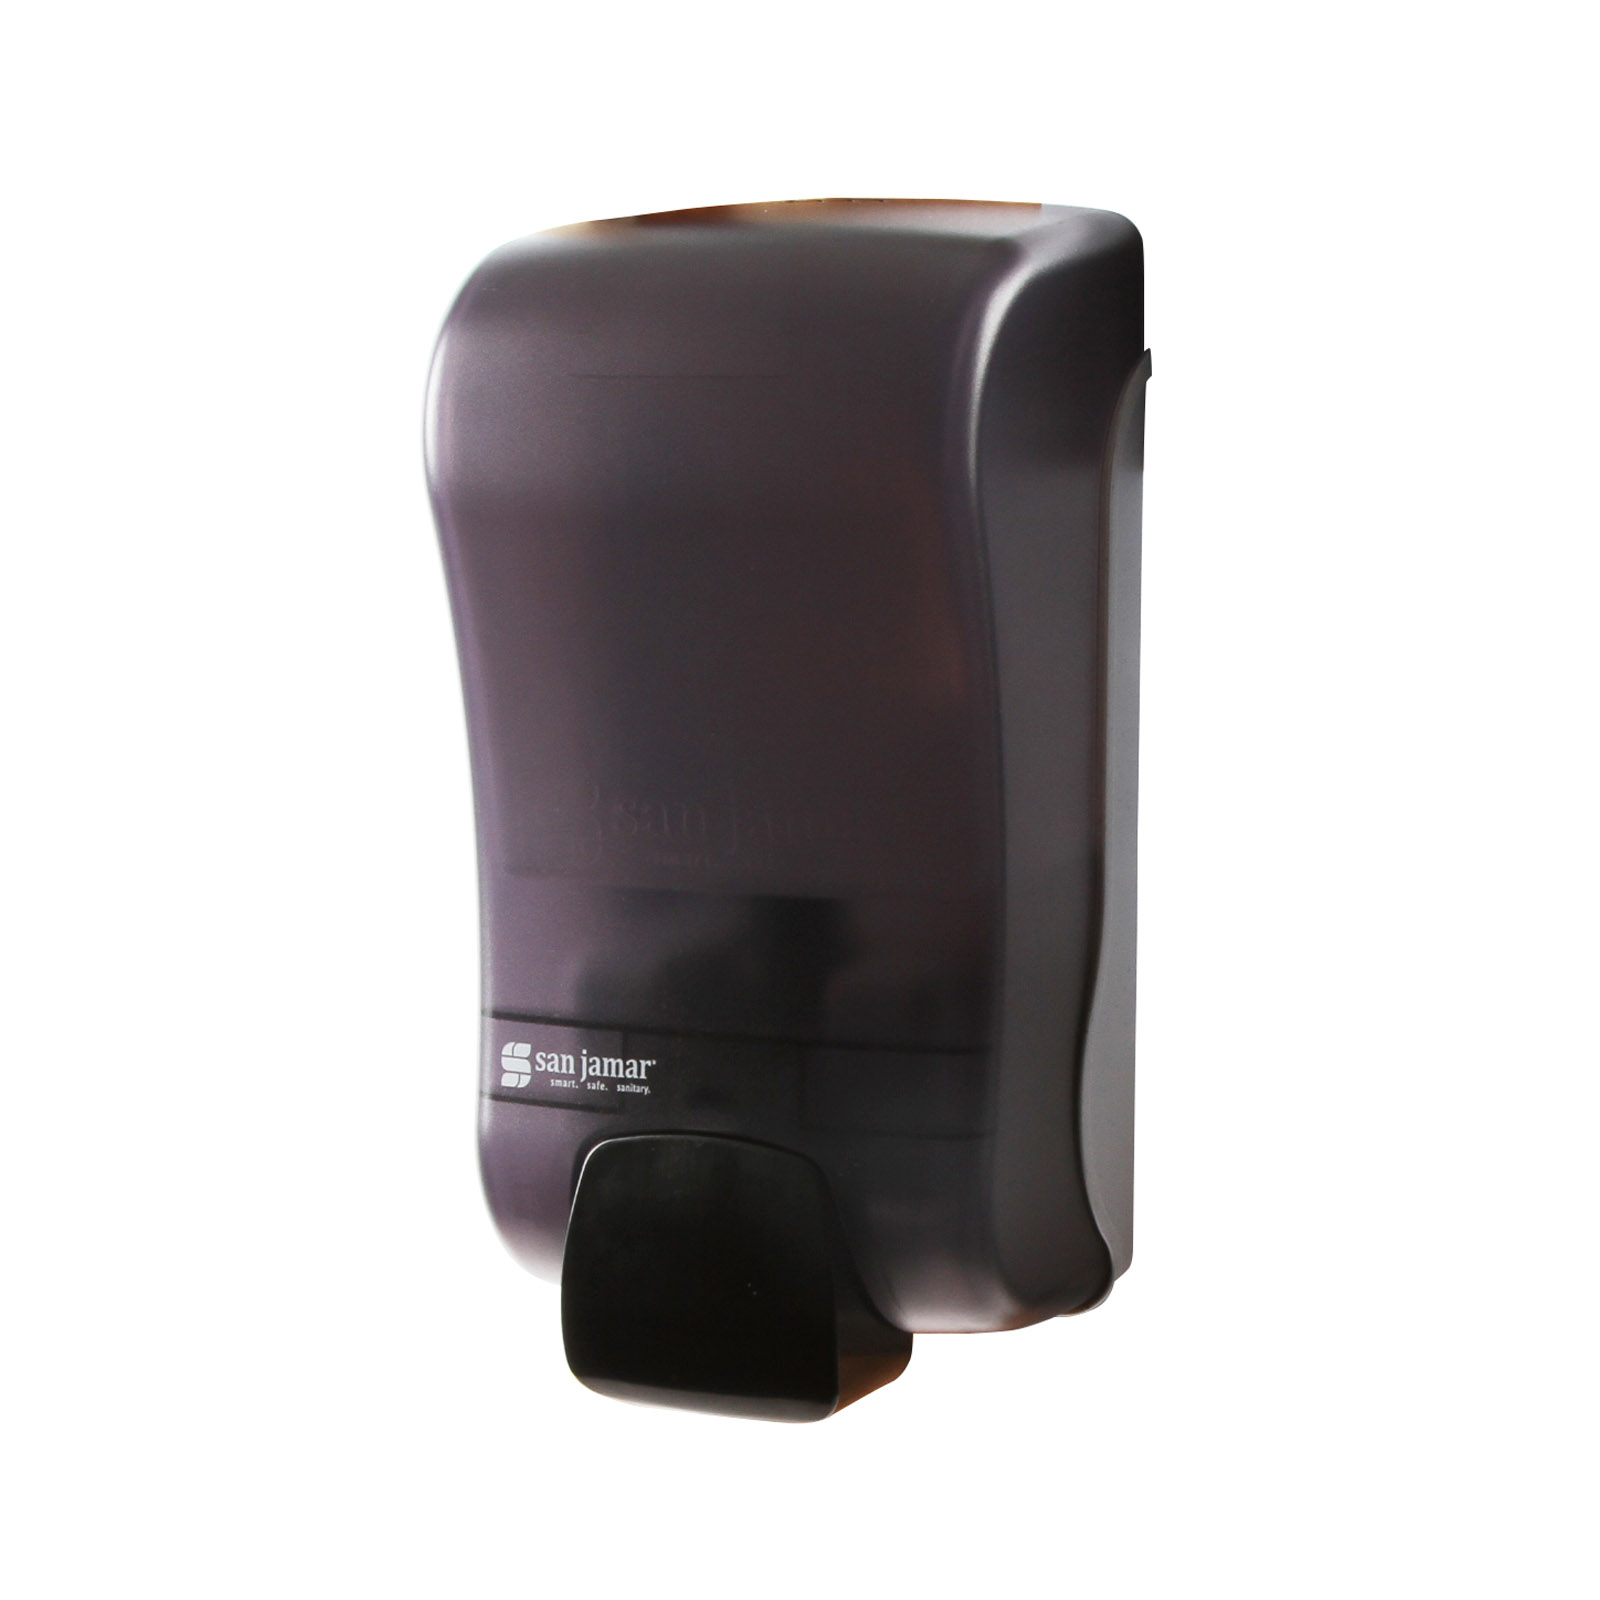 San Jamar SF1300TBK hand soap / sanitizer dispenser